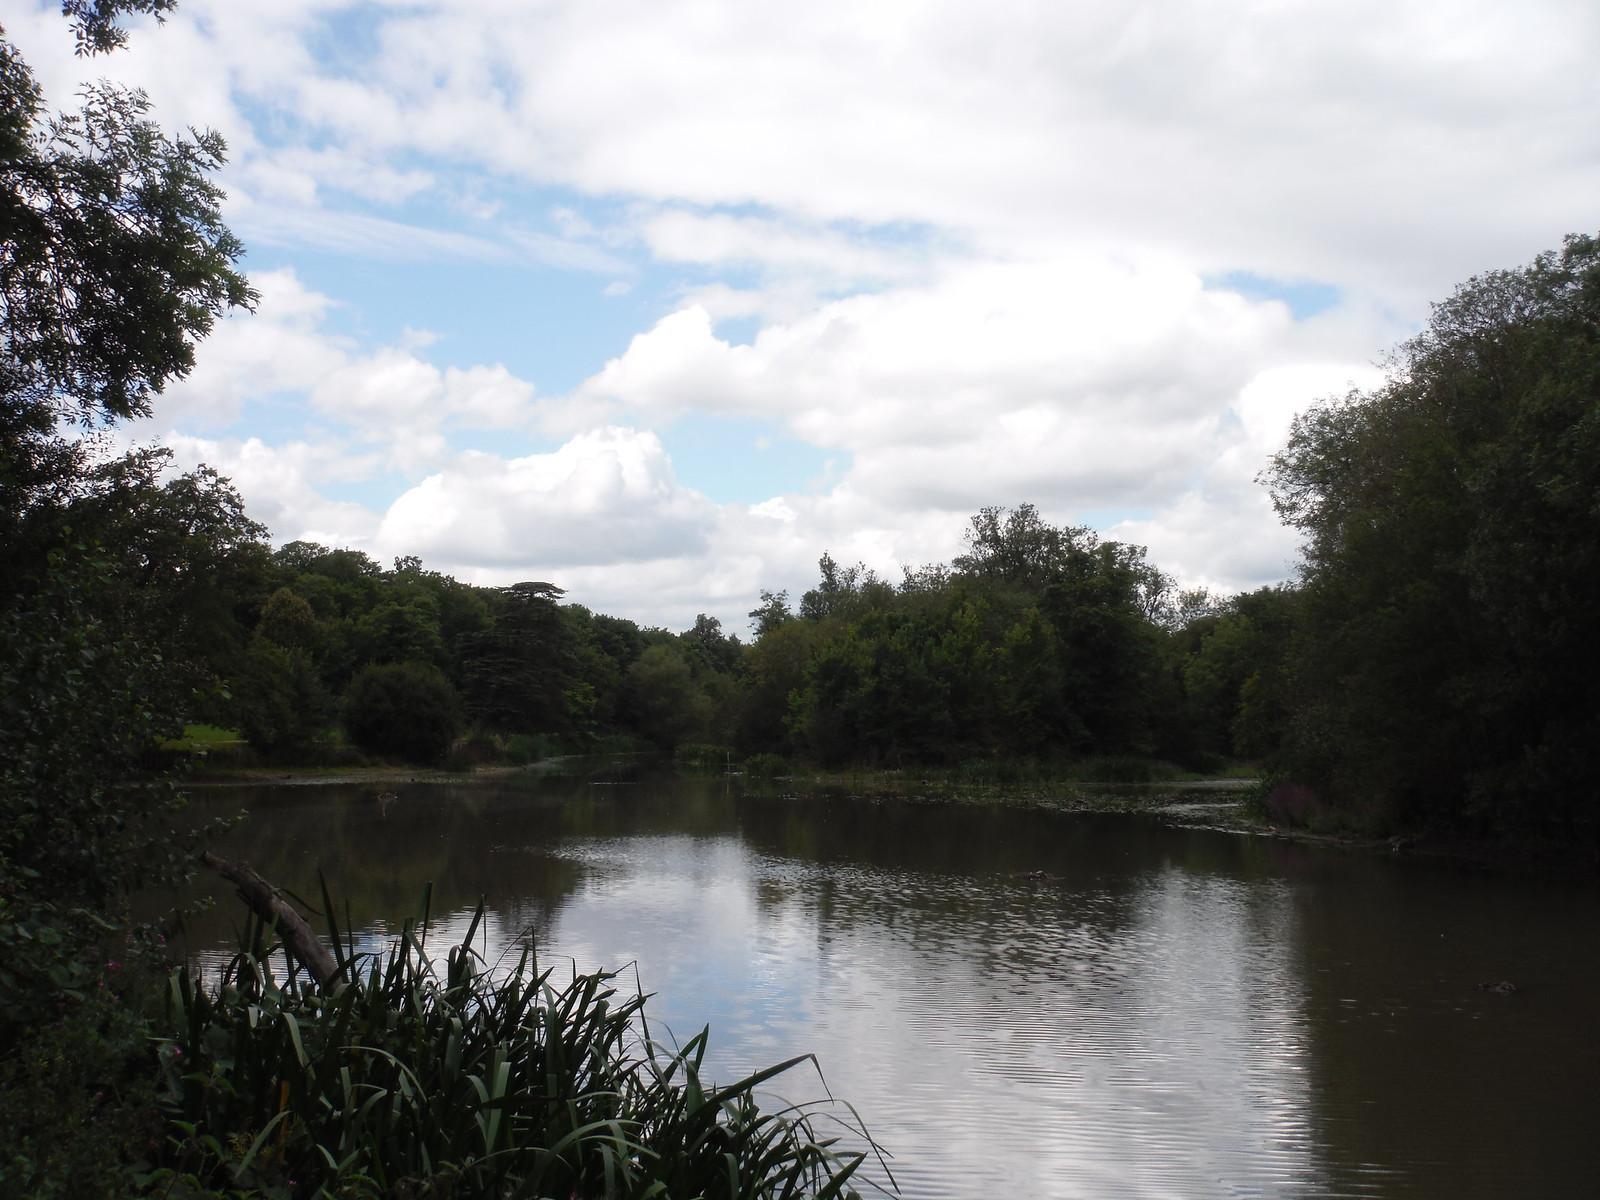 Part of Ornamental Pond SWC Walk Short 11 - Wanstead Park